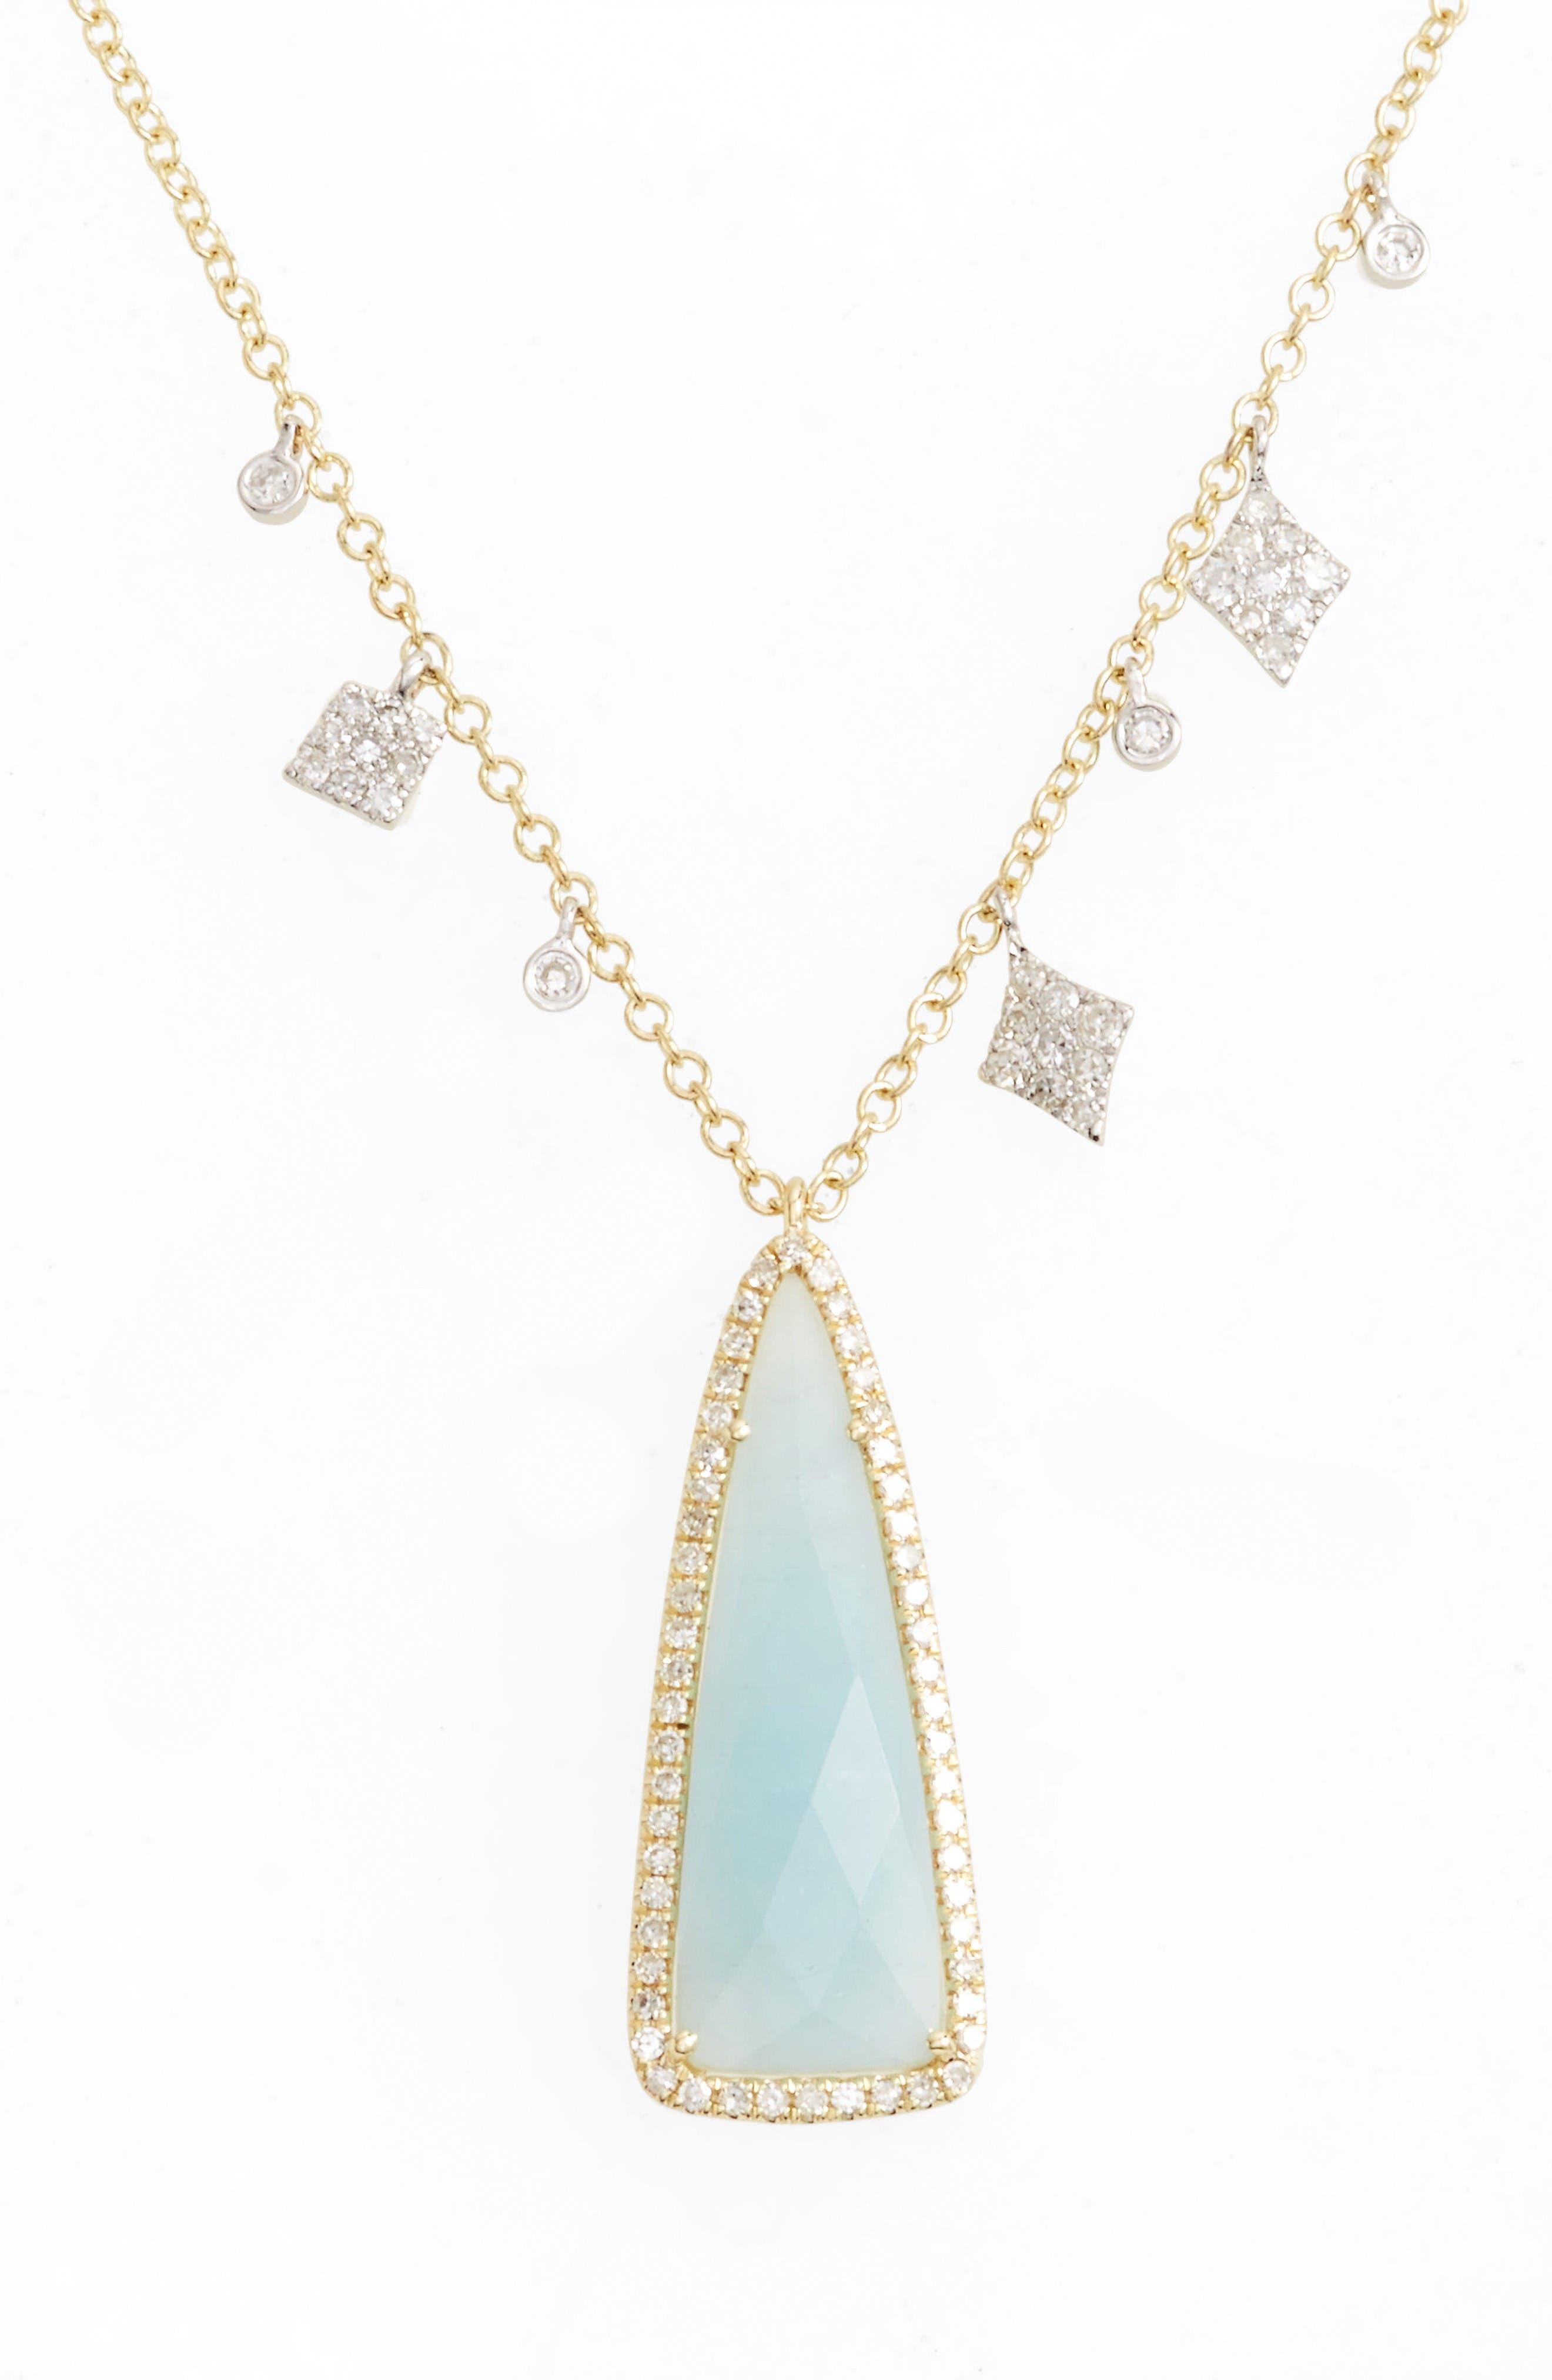 Meira T Diamond & Semiprecious Stone Dangle Charm Necklace